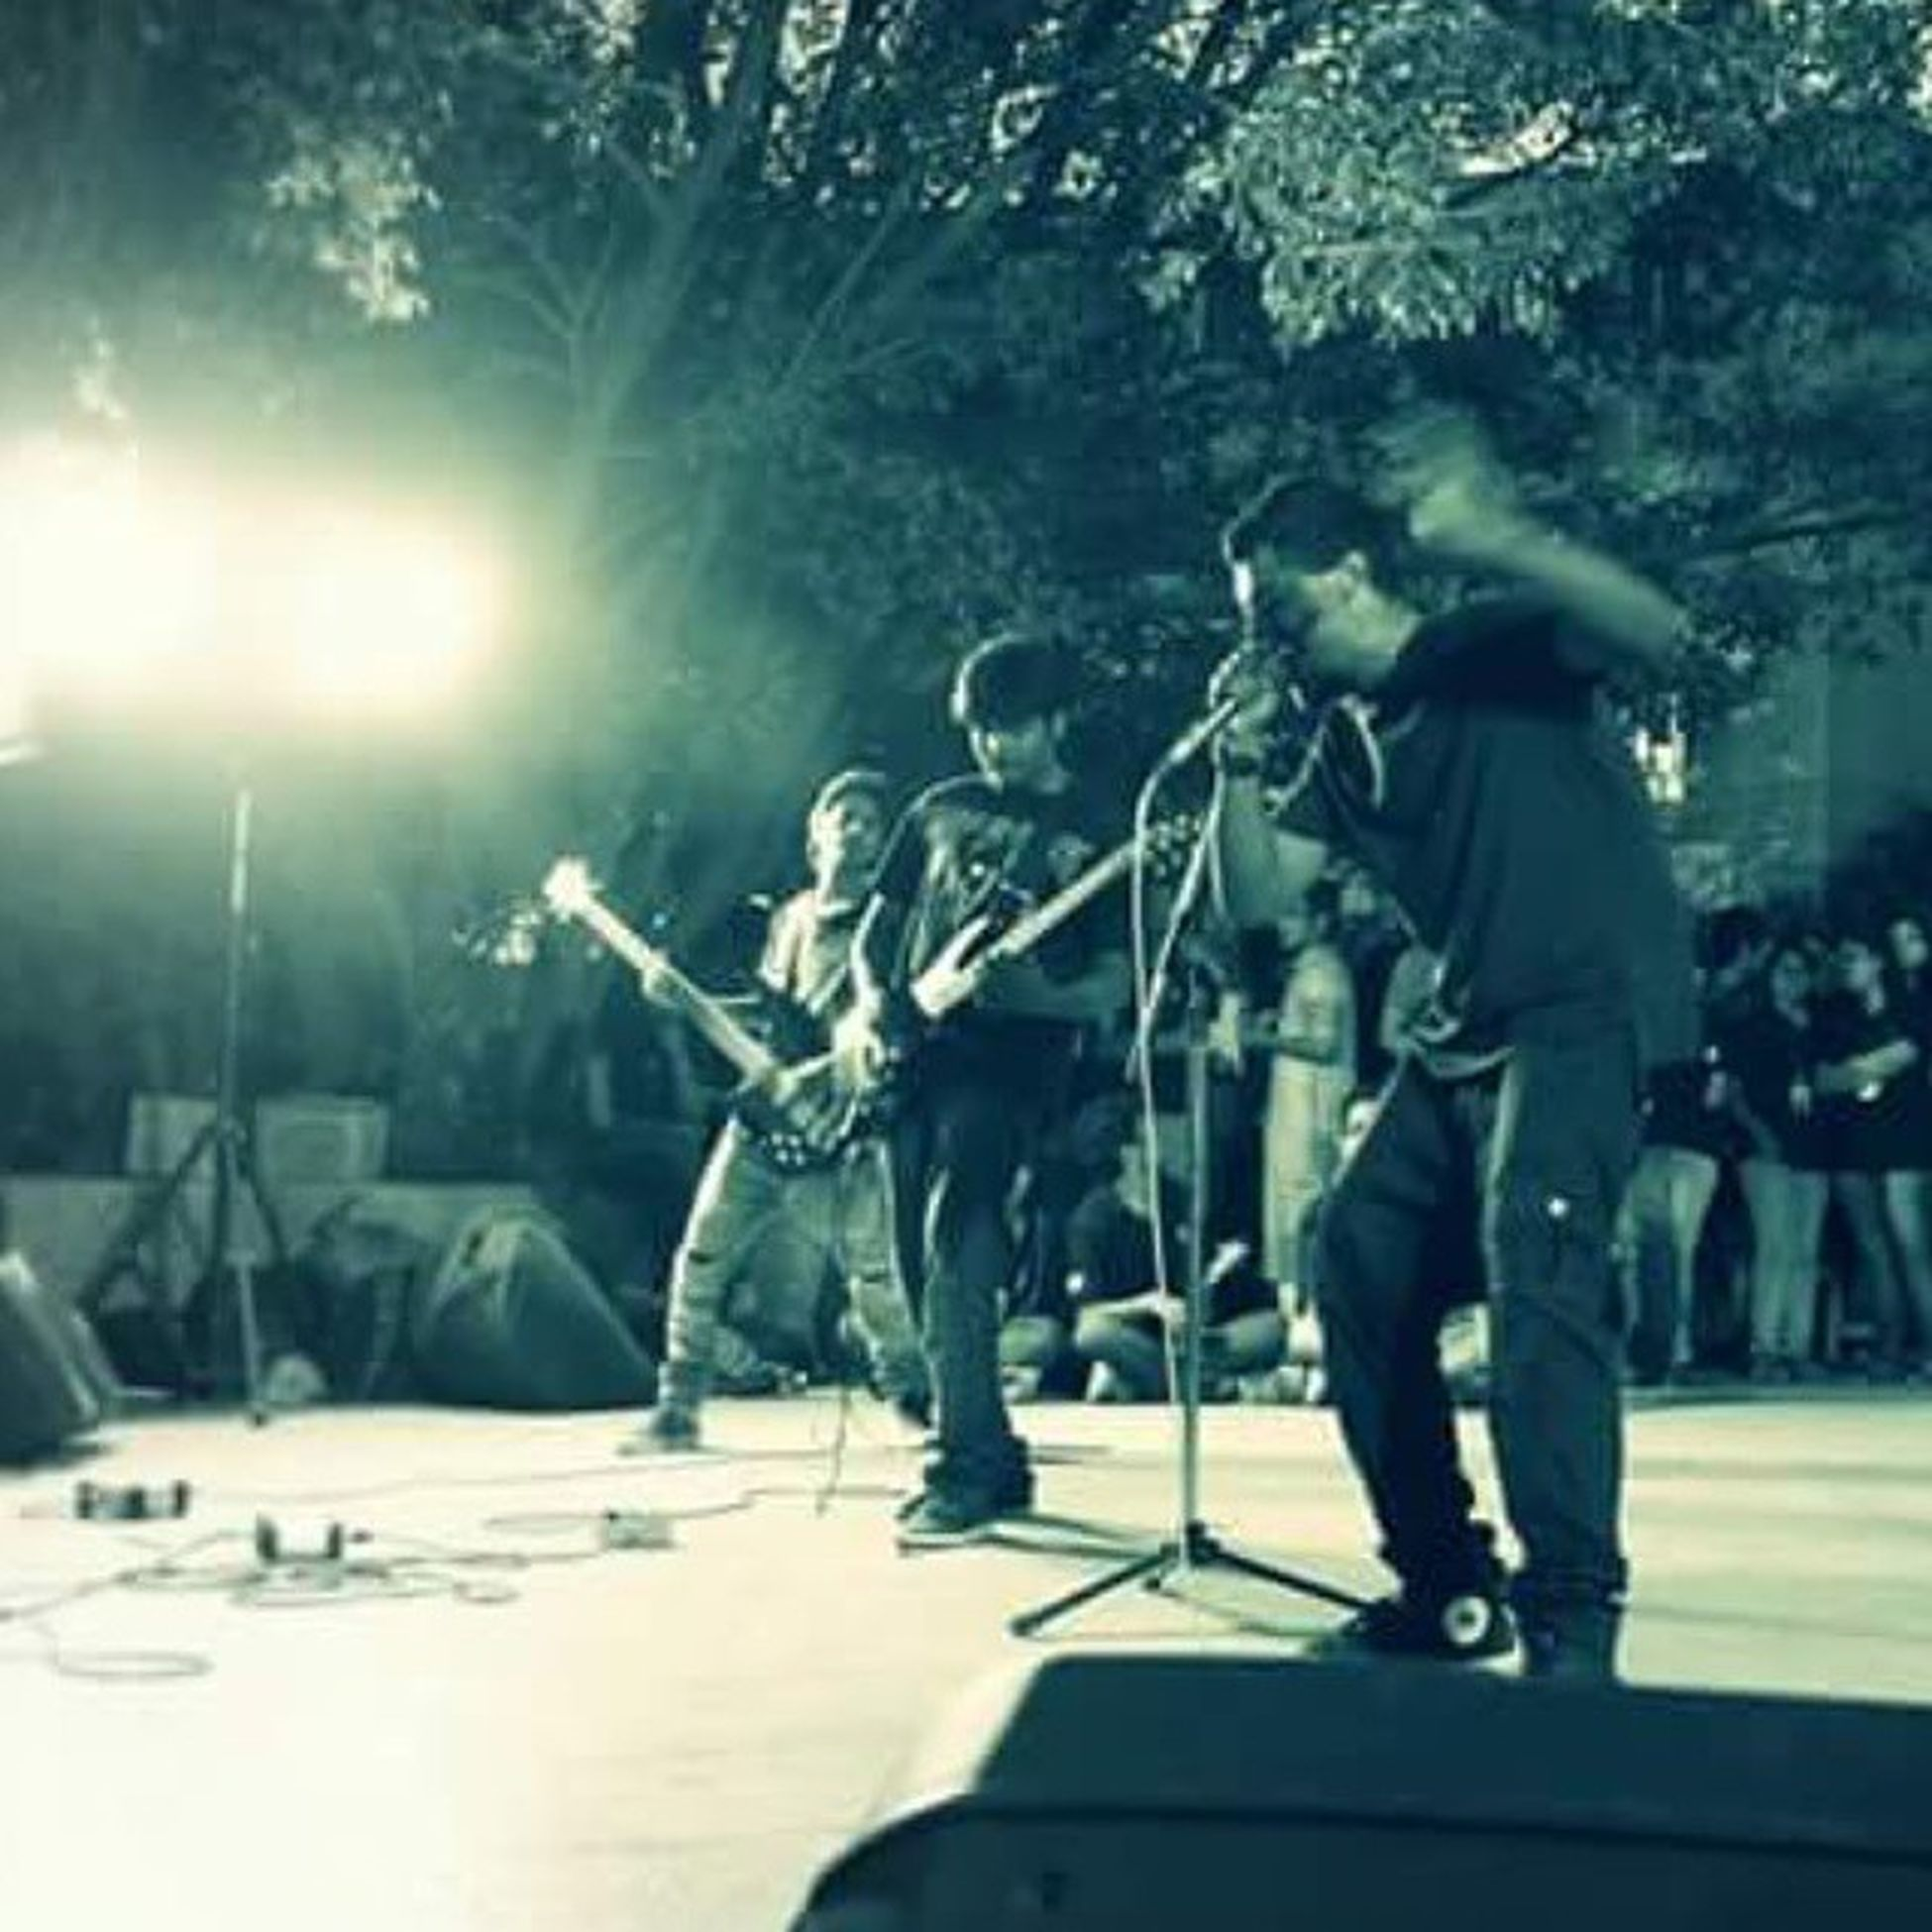 Gig Oda Tandav Witch Warwick cort monitor mic madness metal metalhead bharti vidhyapeeth